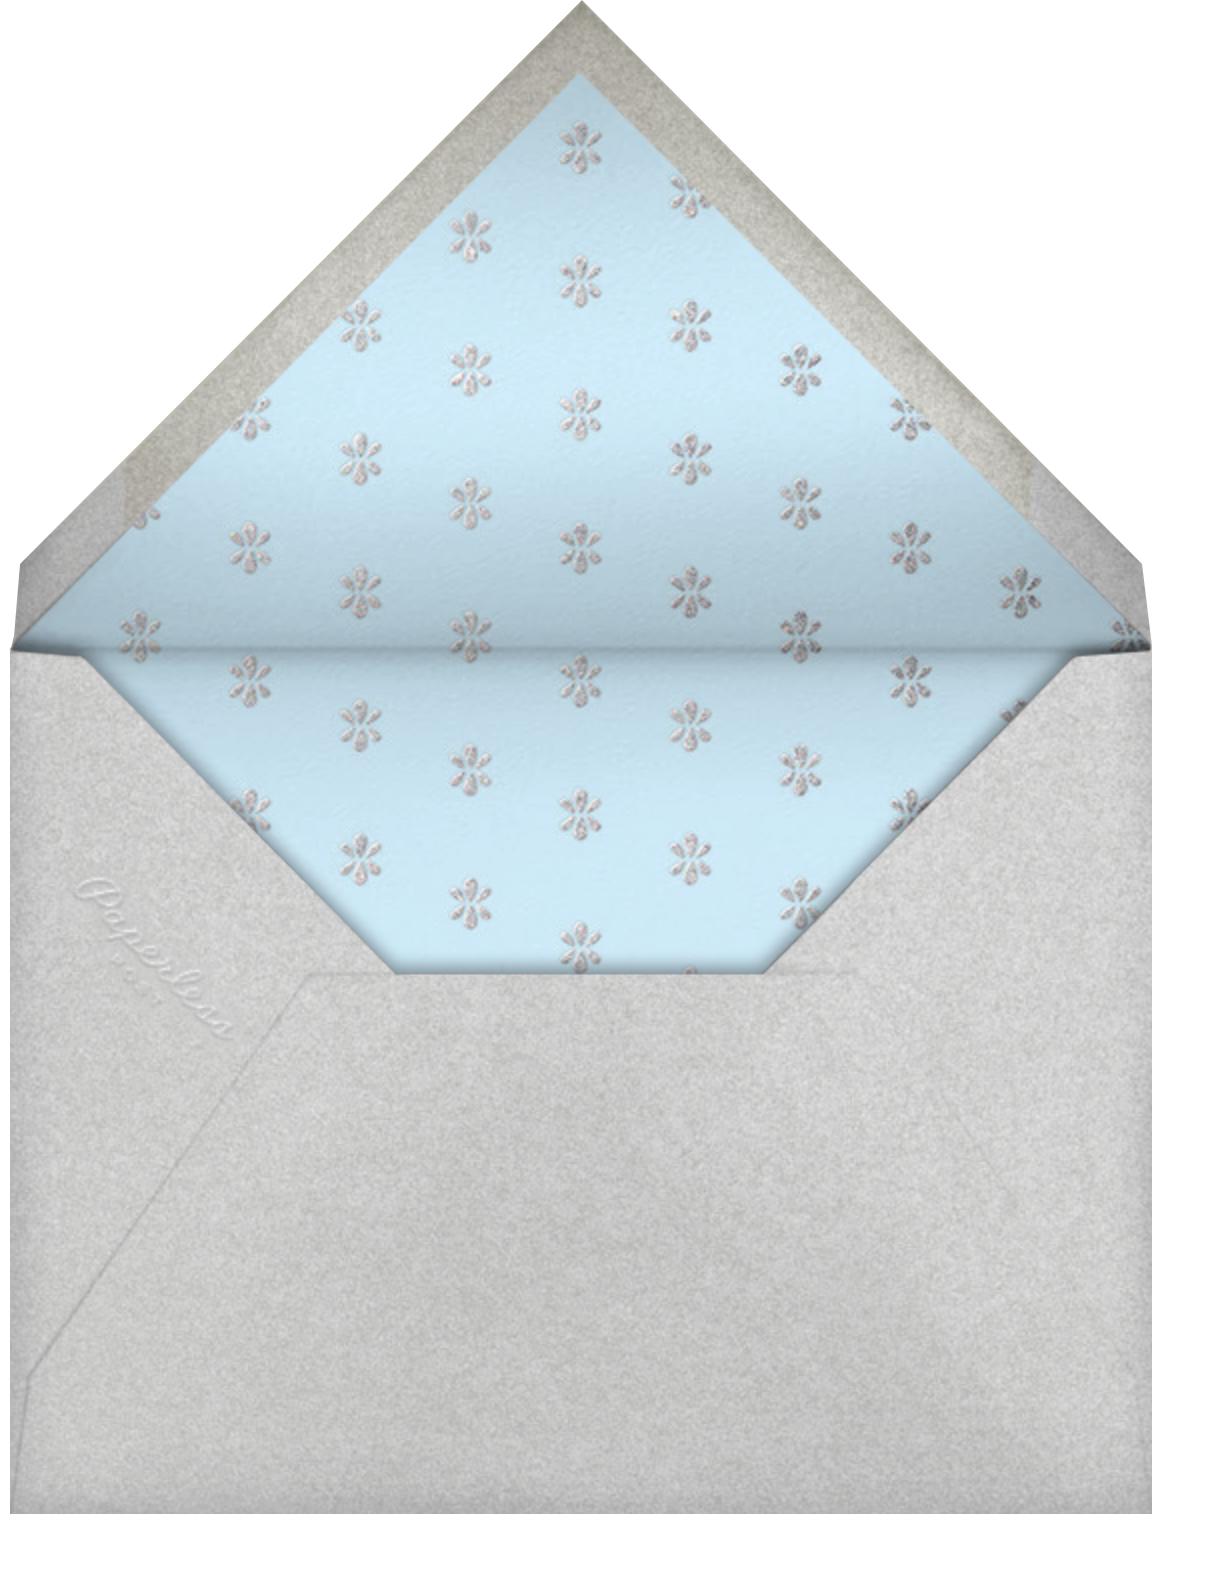 Ornate Occasion - Glacier - Paperless Post - Envelope